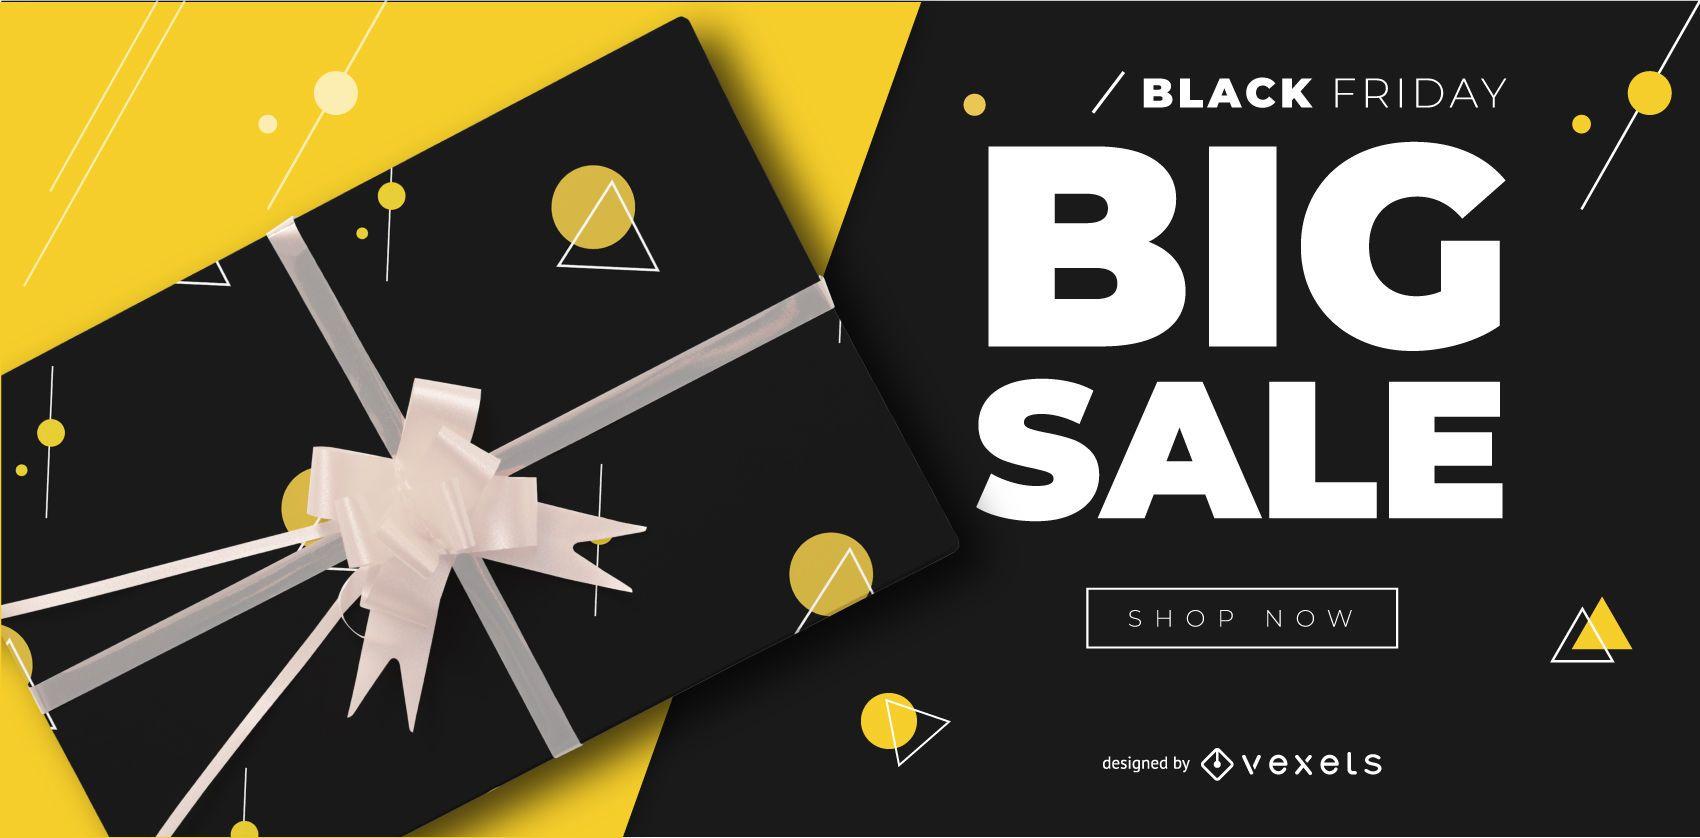 Black friday big sale editable banner